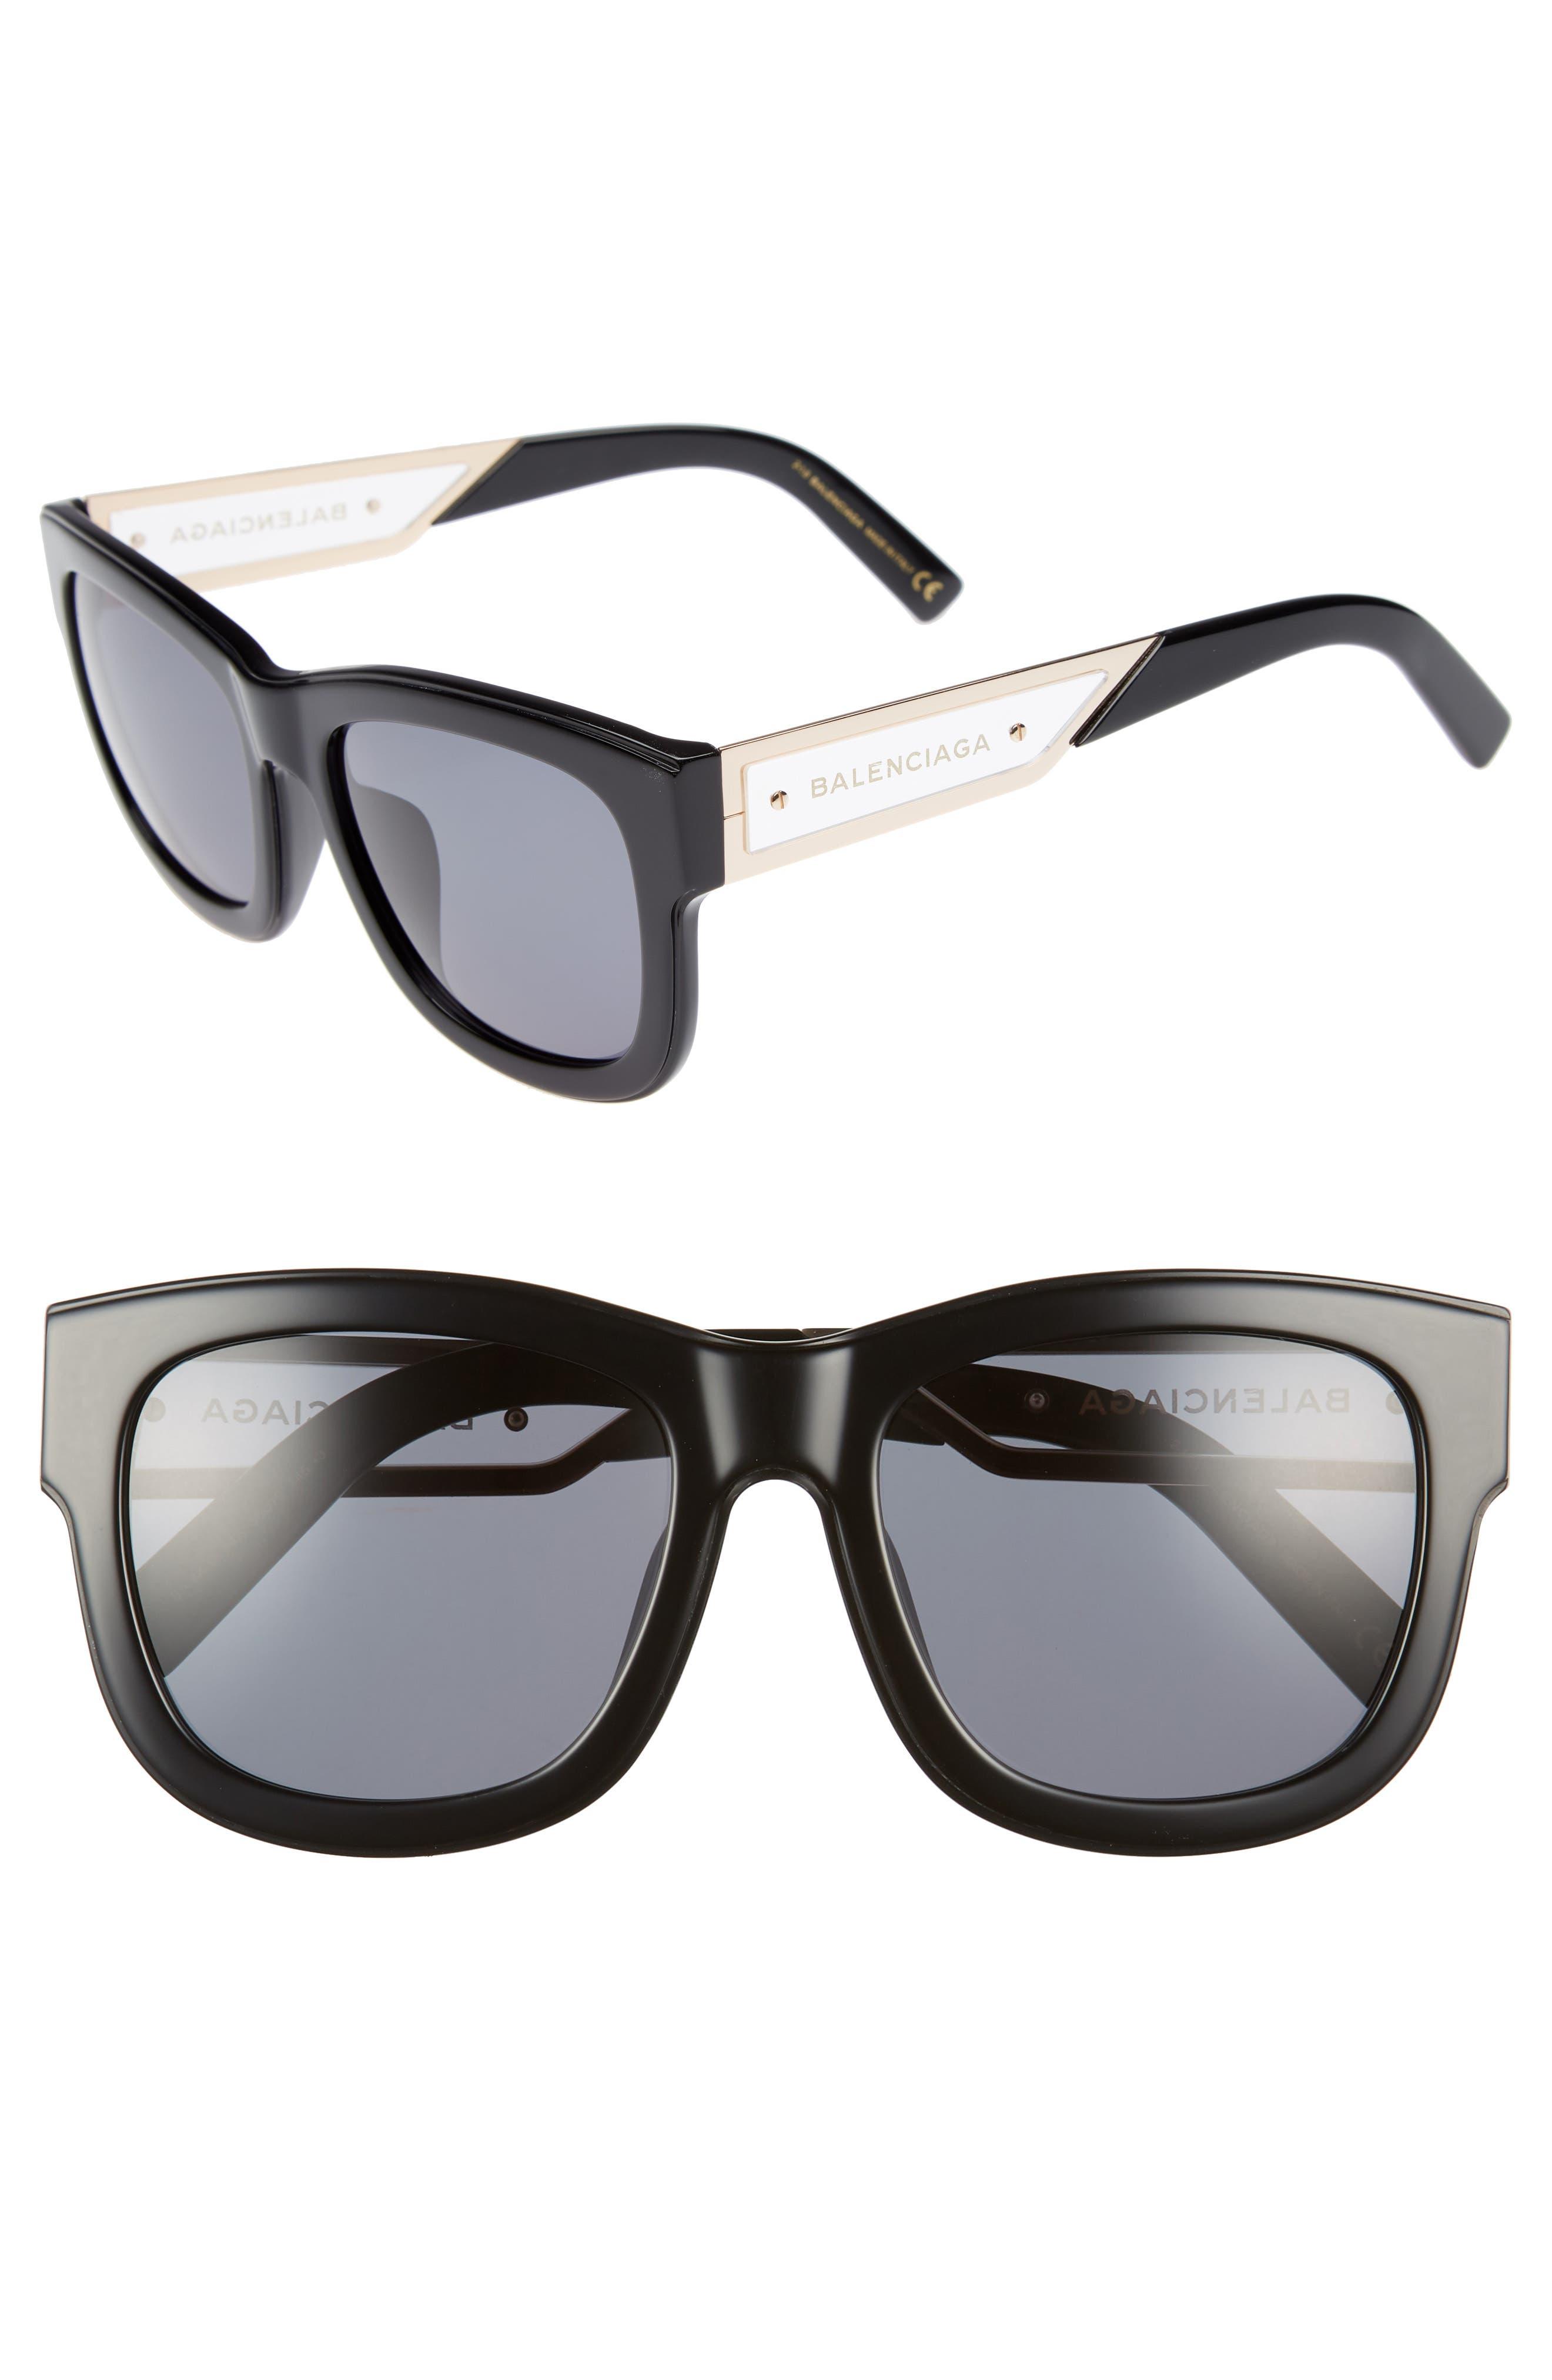 BALENCIAGA,                             56mm Cat Eye Sunglasses,                             Main thumbnail 1, color,                             018